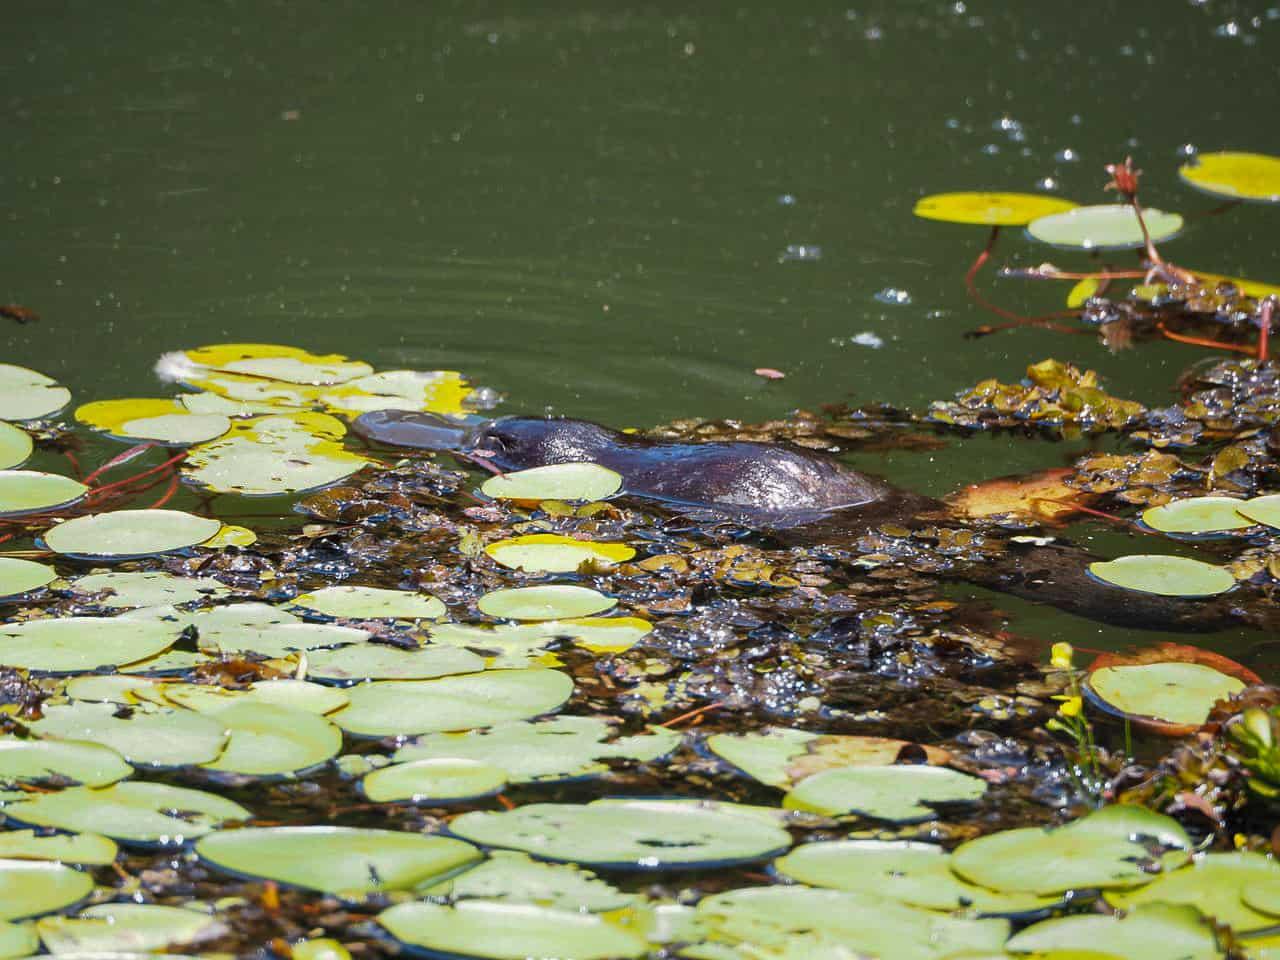 Australian-Platypus-Park-Atherton-Tablelands-North-Queensland-Australia ] Travel Mermaid 002